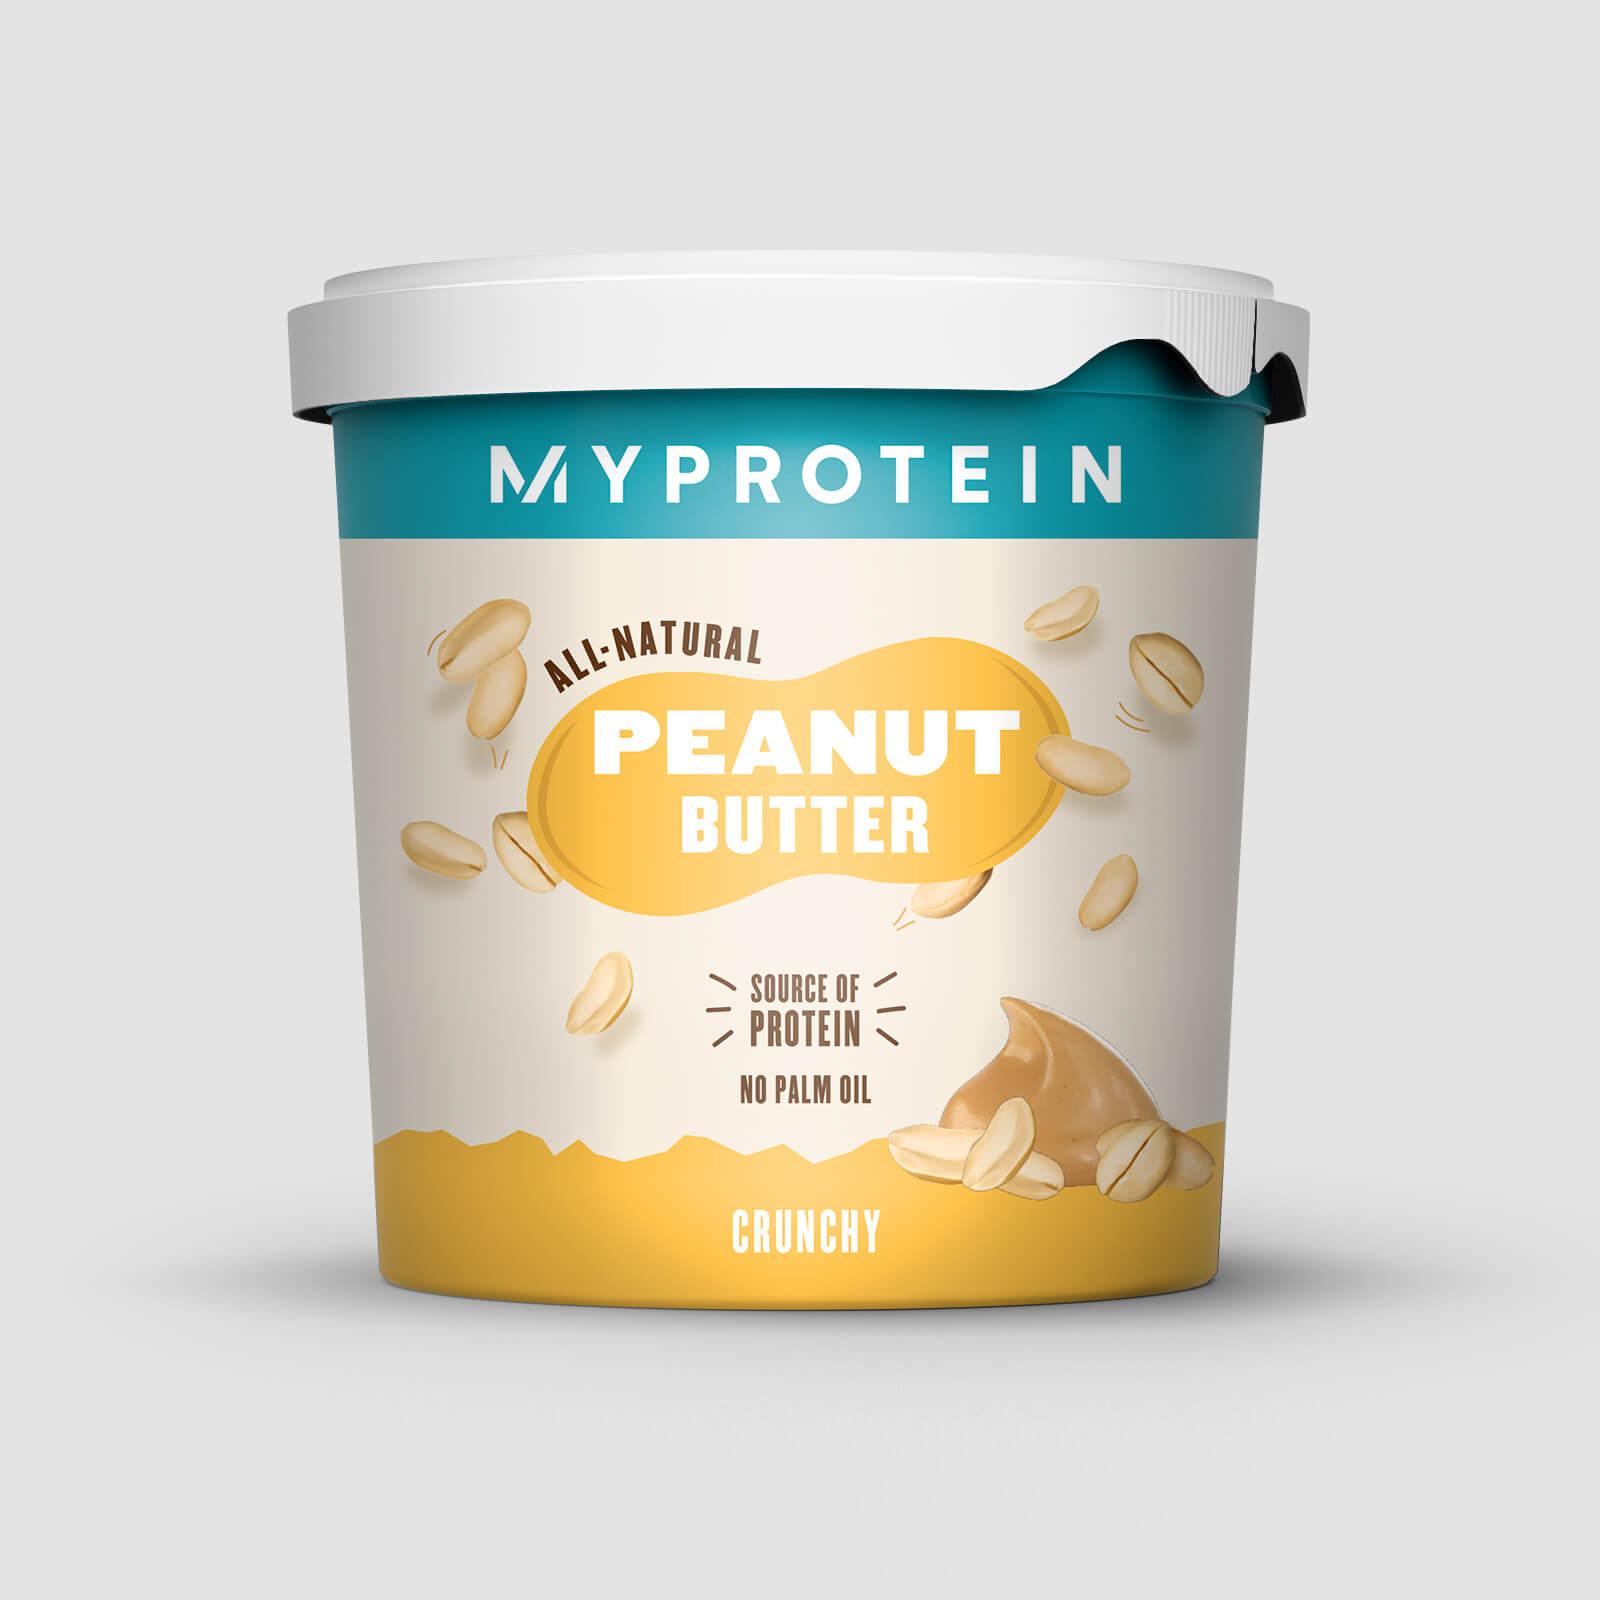 Myprotein Peanøttsmør Naturlig - Original - Crunchy